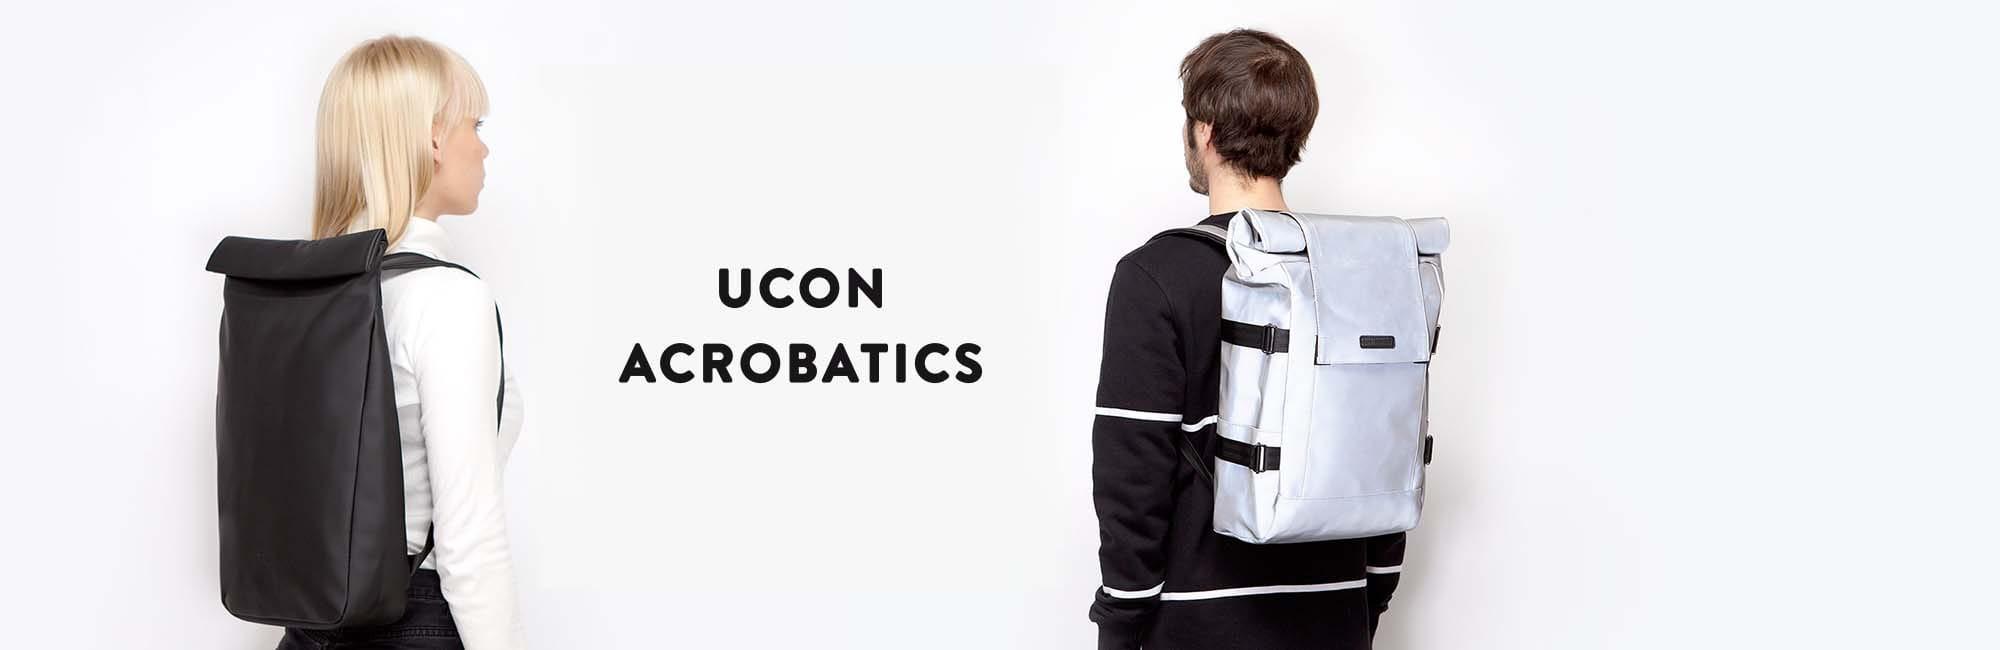 Ucon Acrobatics